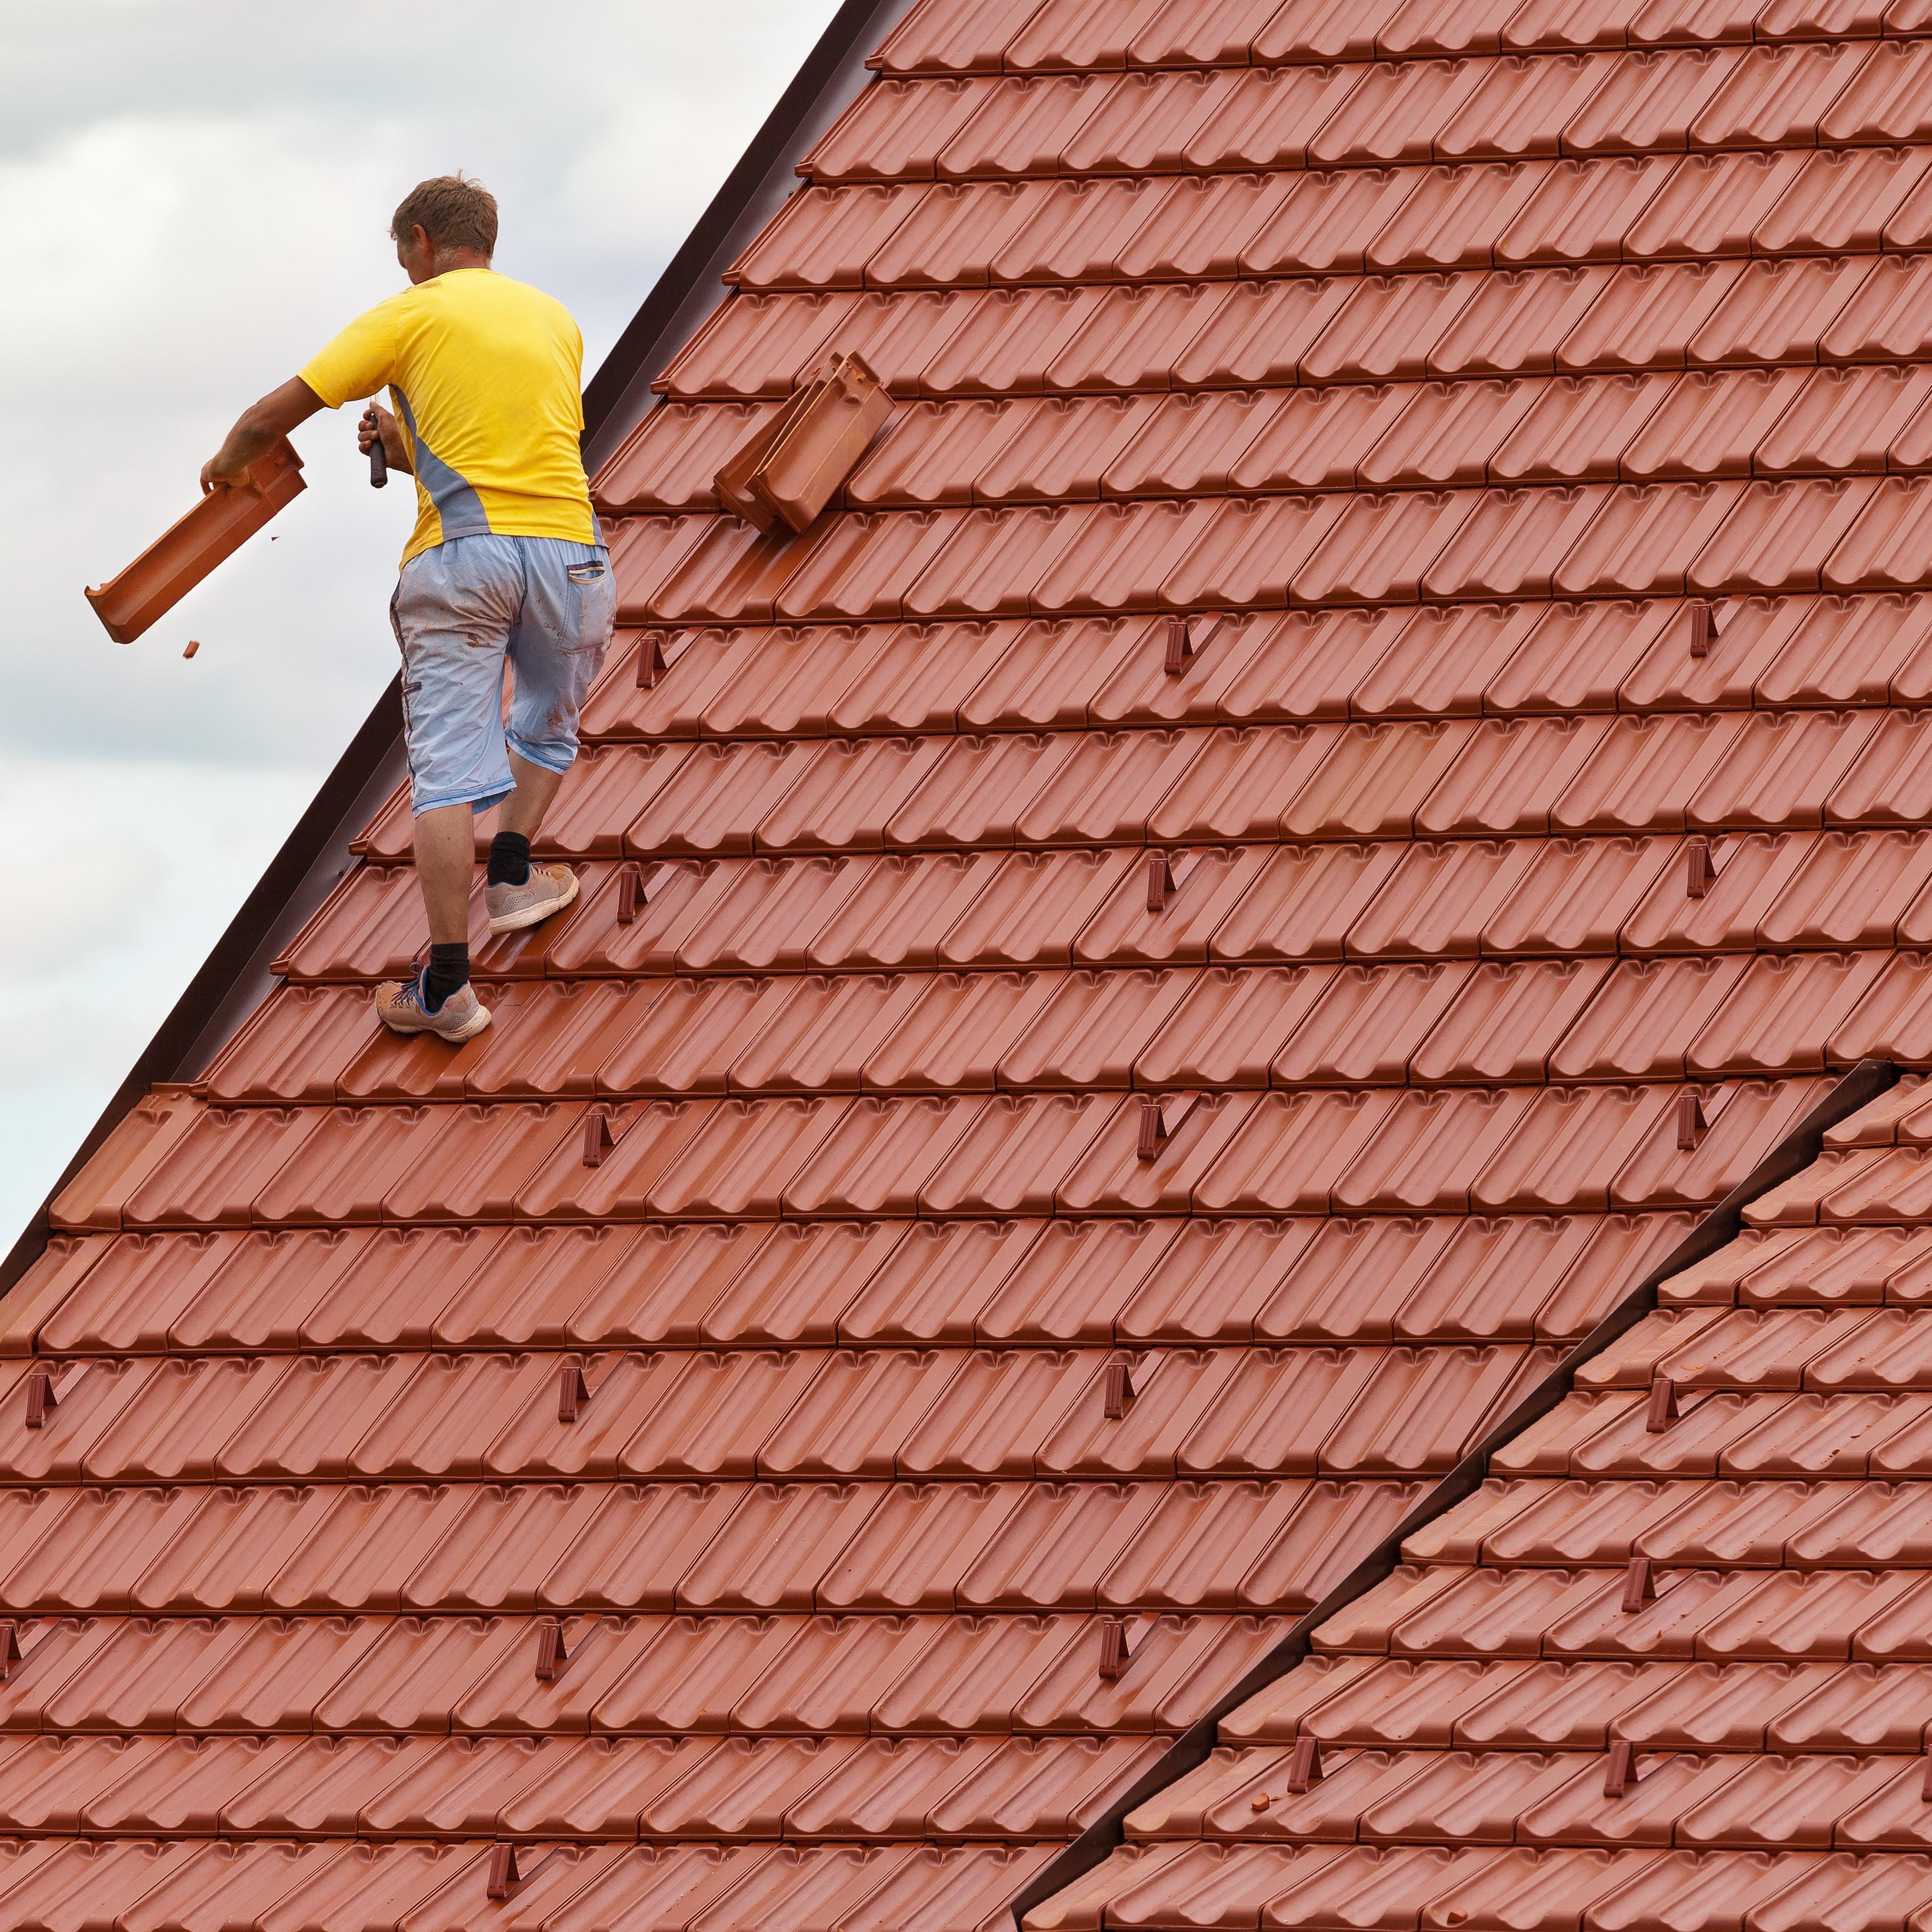 A roofer removing broken roof materials.